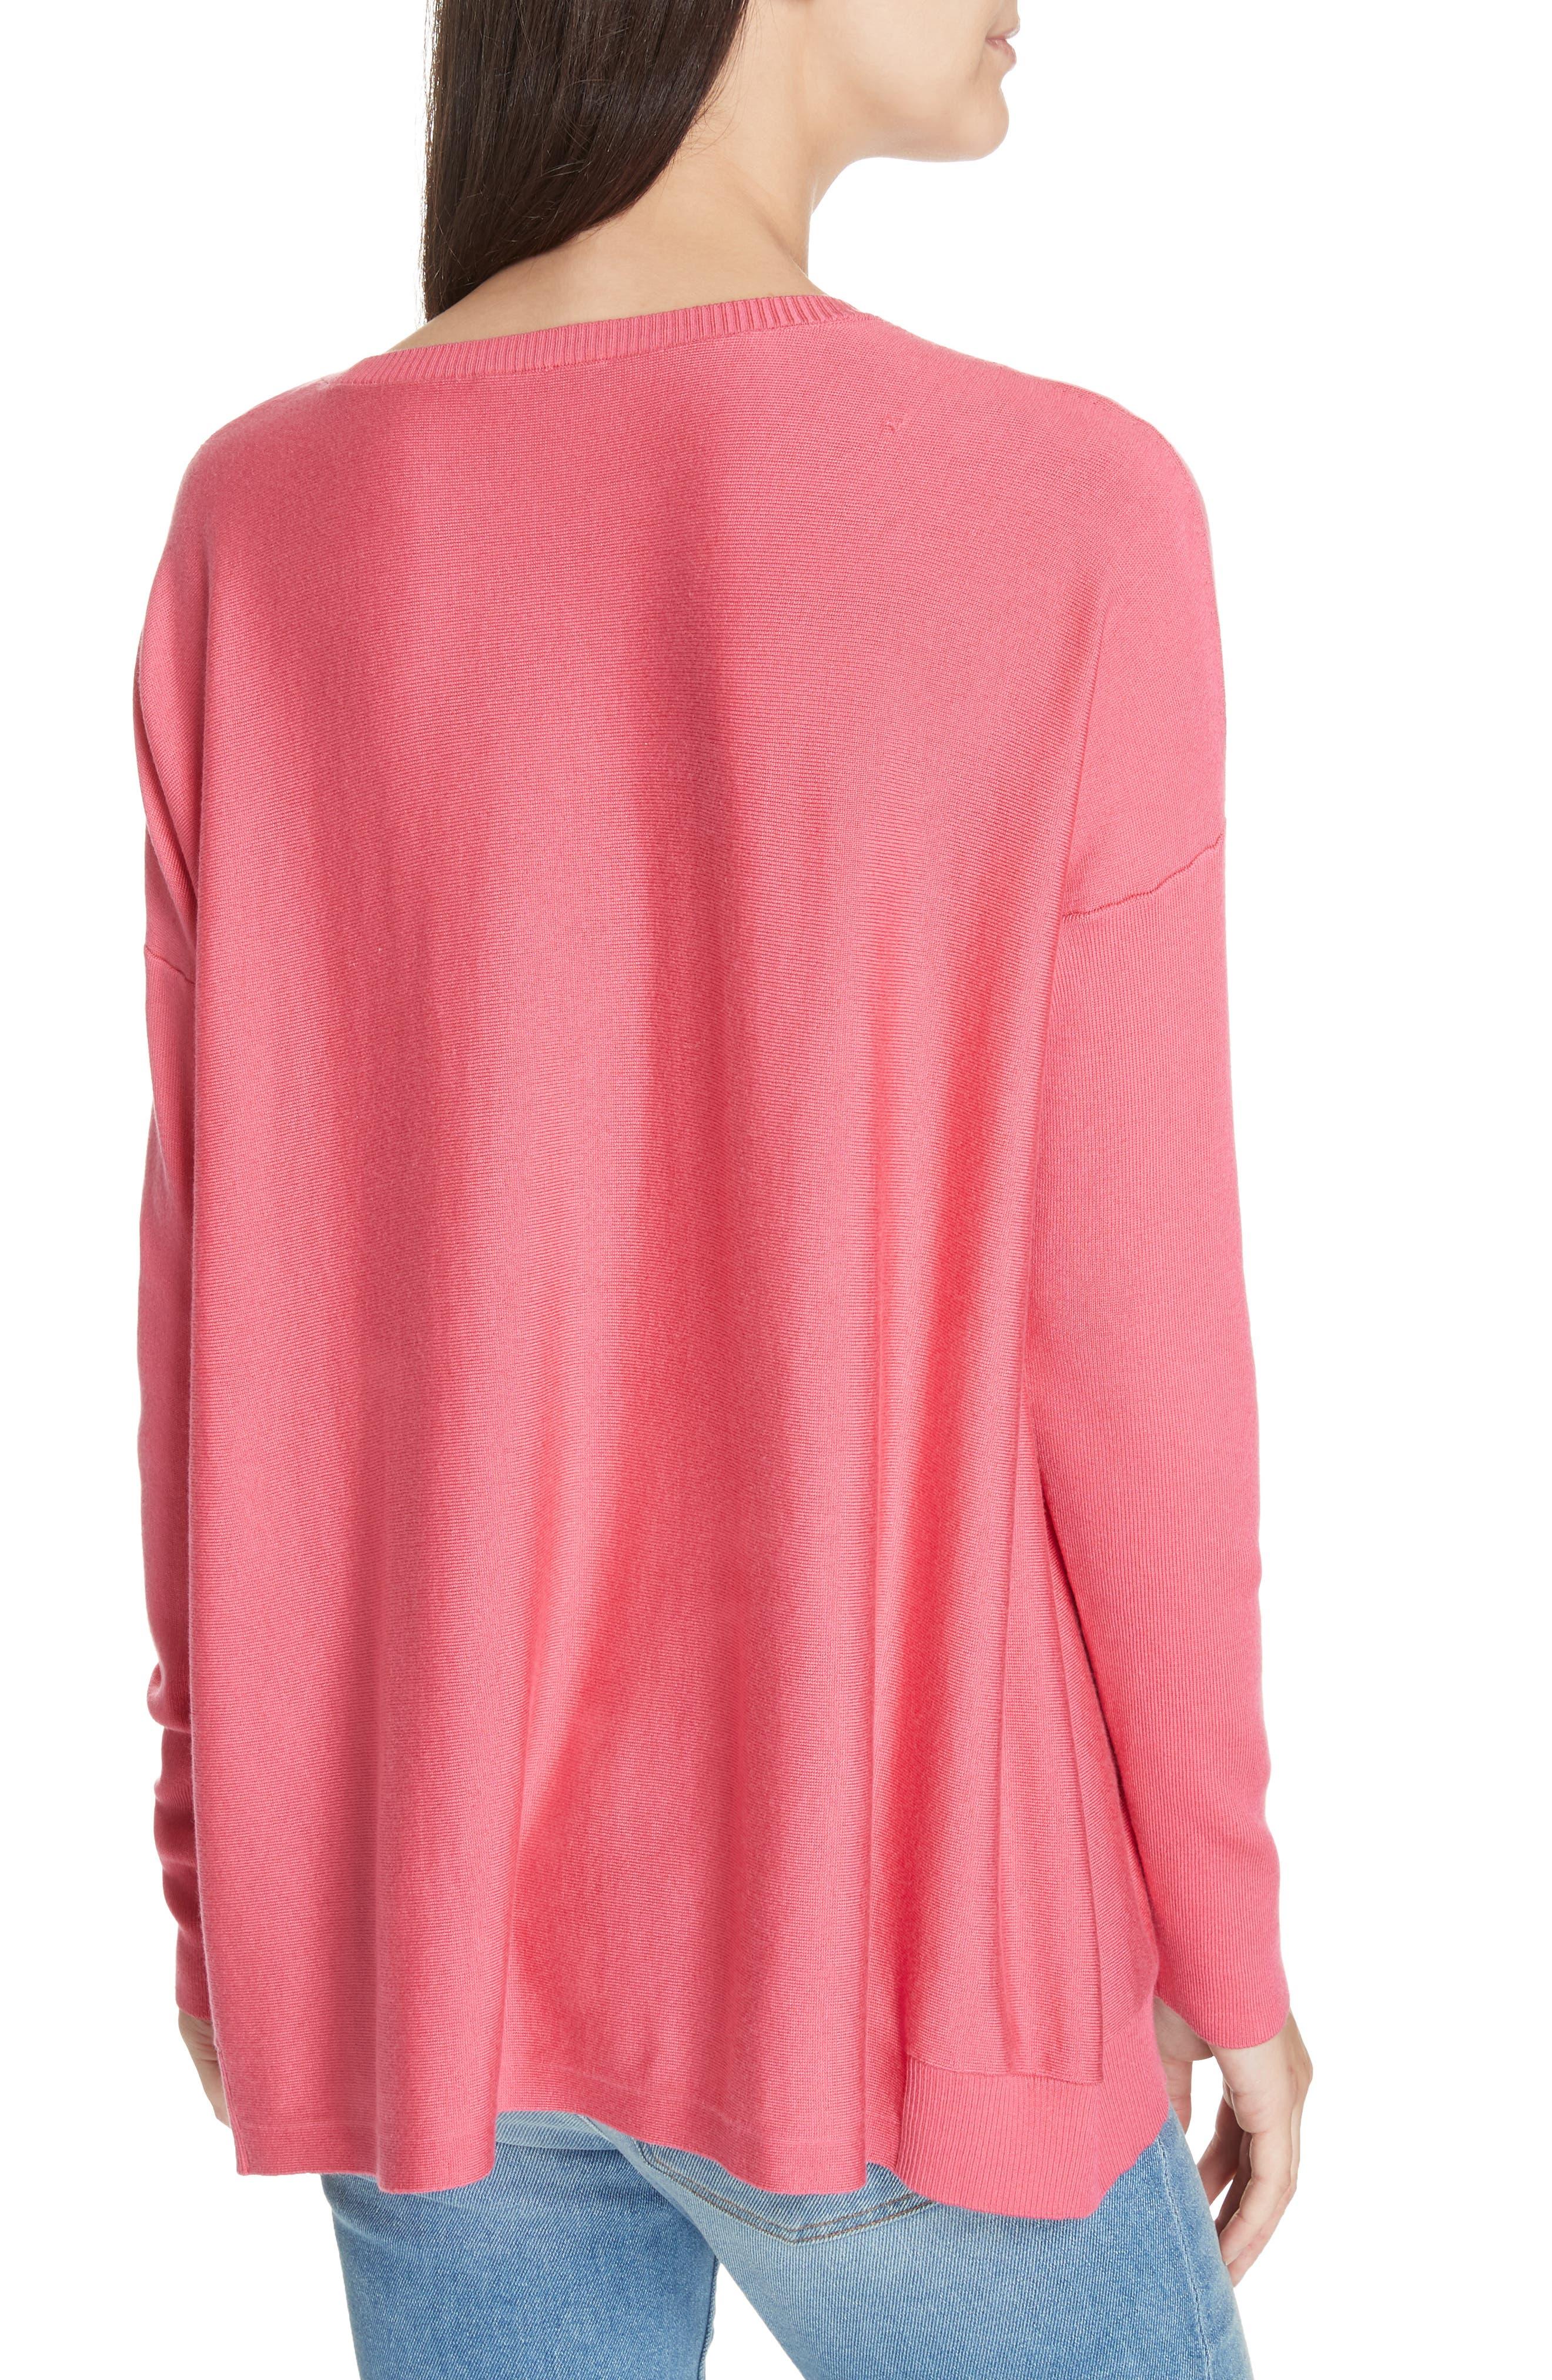 Tencel<sup>®</sup> Lyocell Blend Sweater,                             Alternate thumbnail 2, color,                             CHERRY LANE